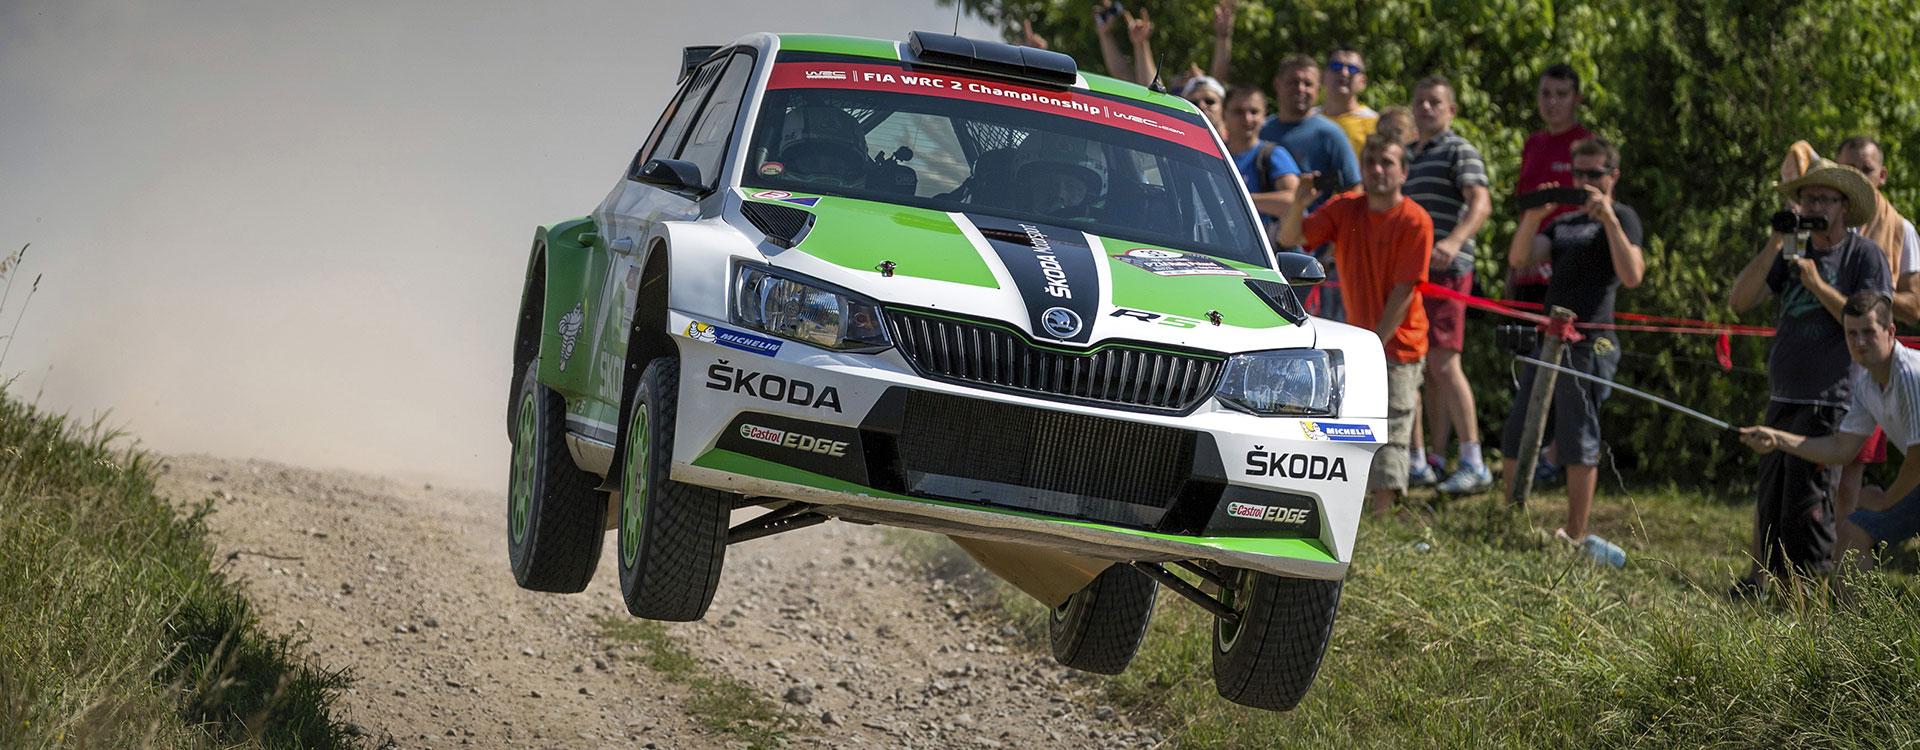 PHOTO: ŠKODA Motorsport at the Rally Poland